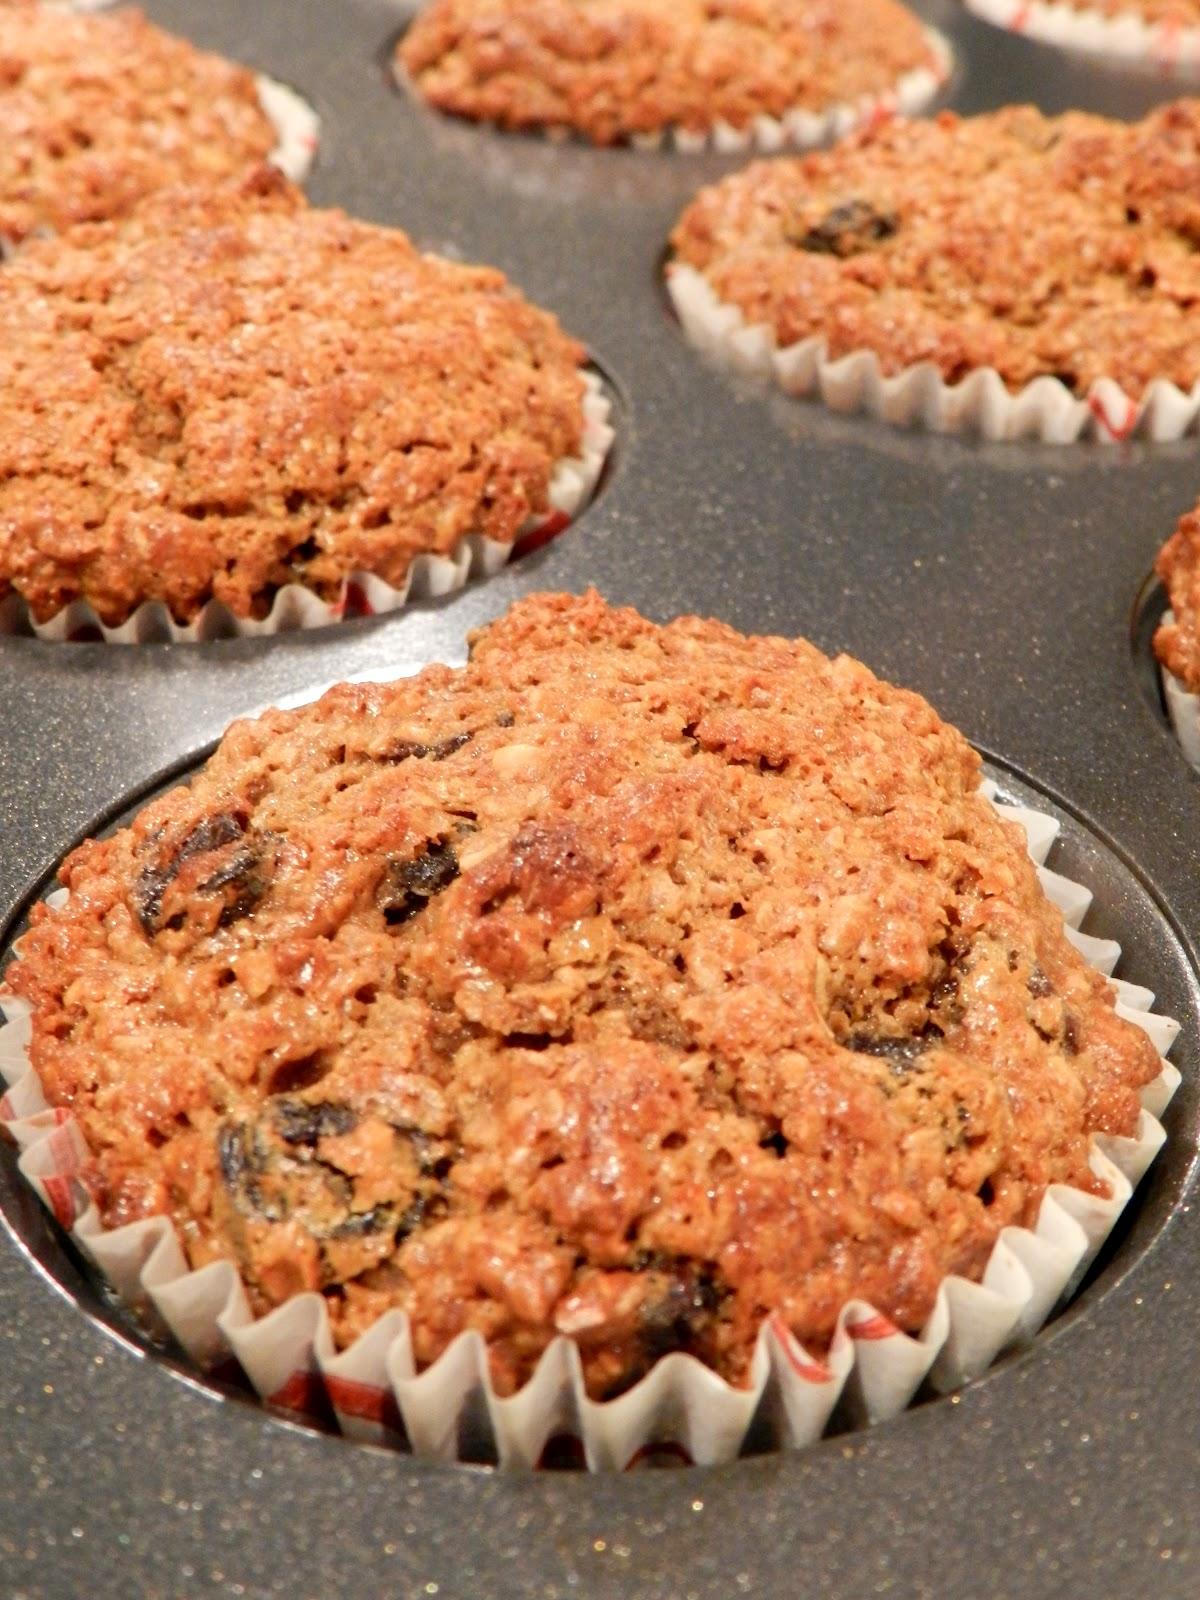 The Baking Bookworm: Sour Cream Raisin Bran Muffins